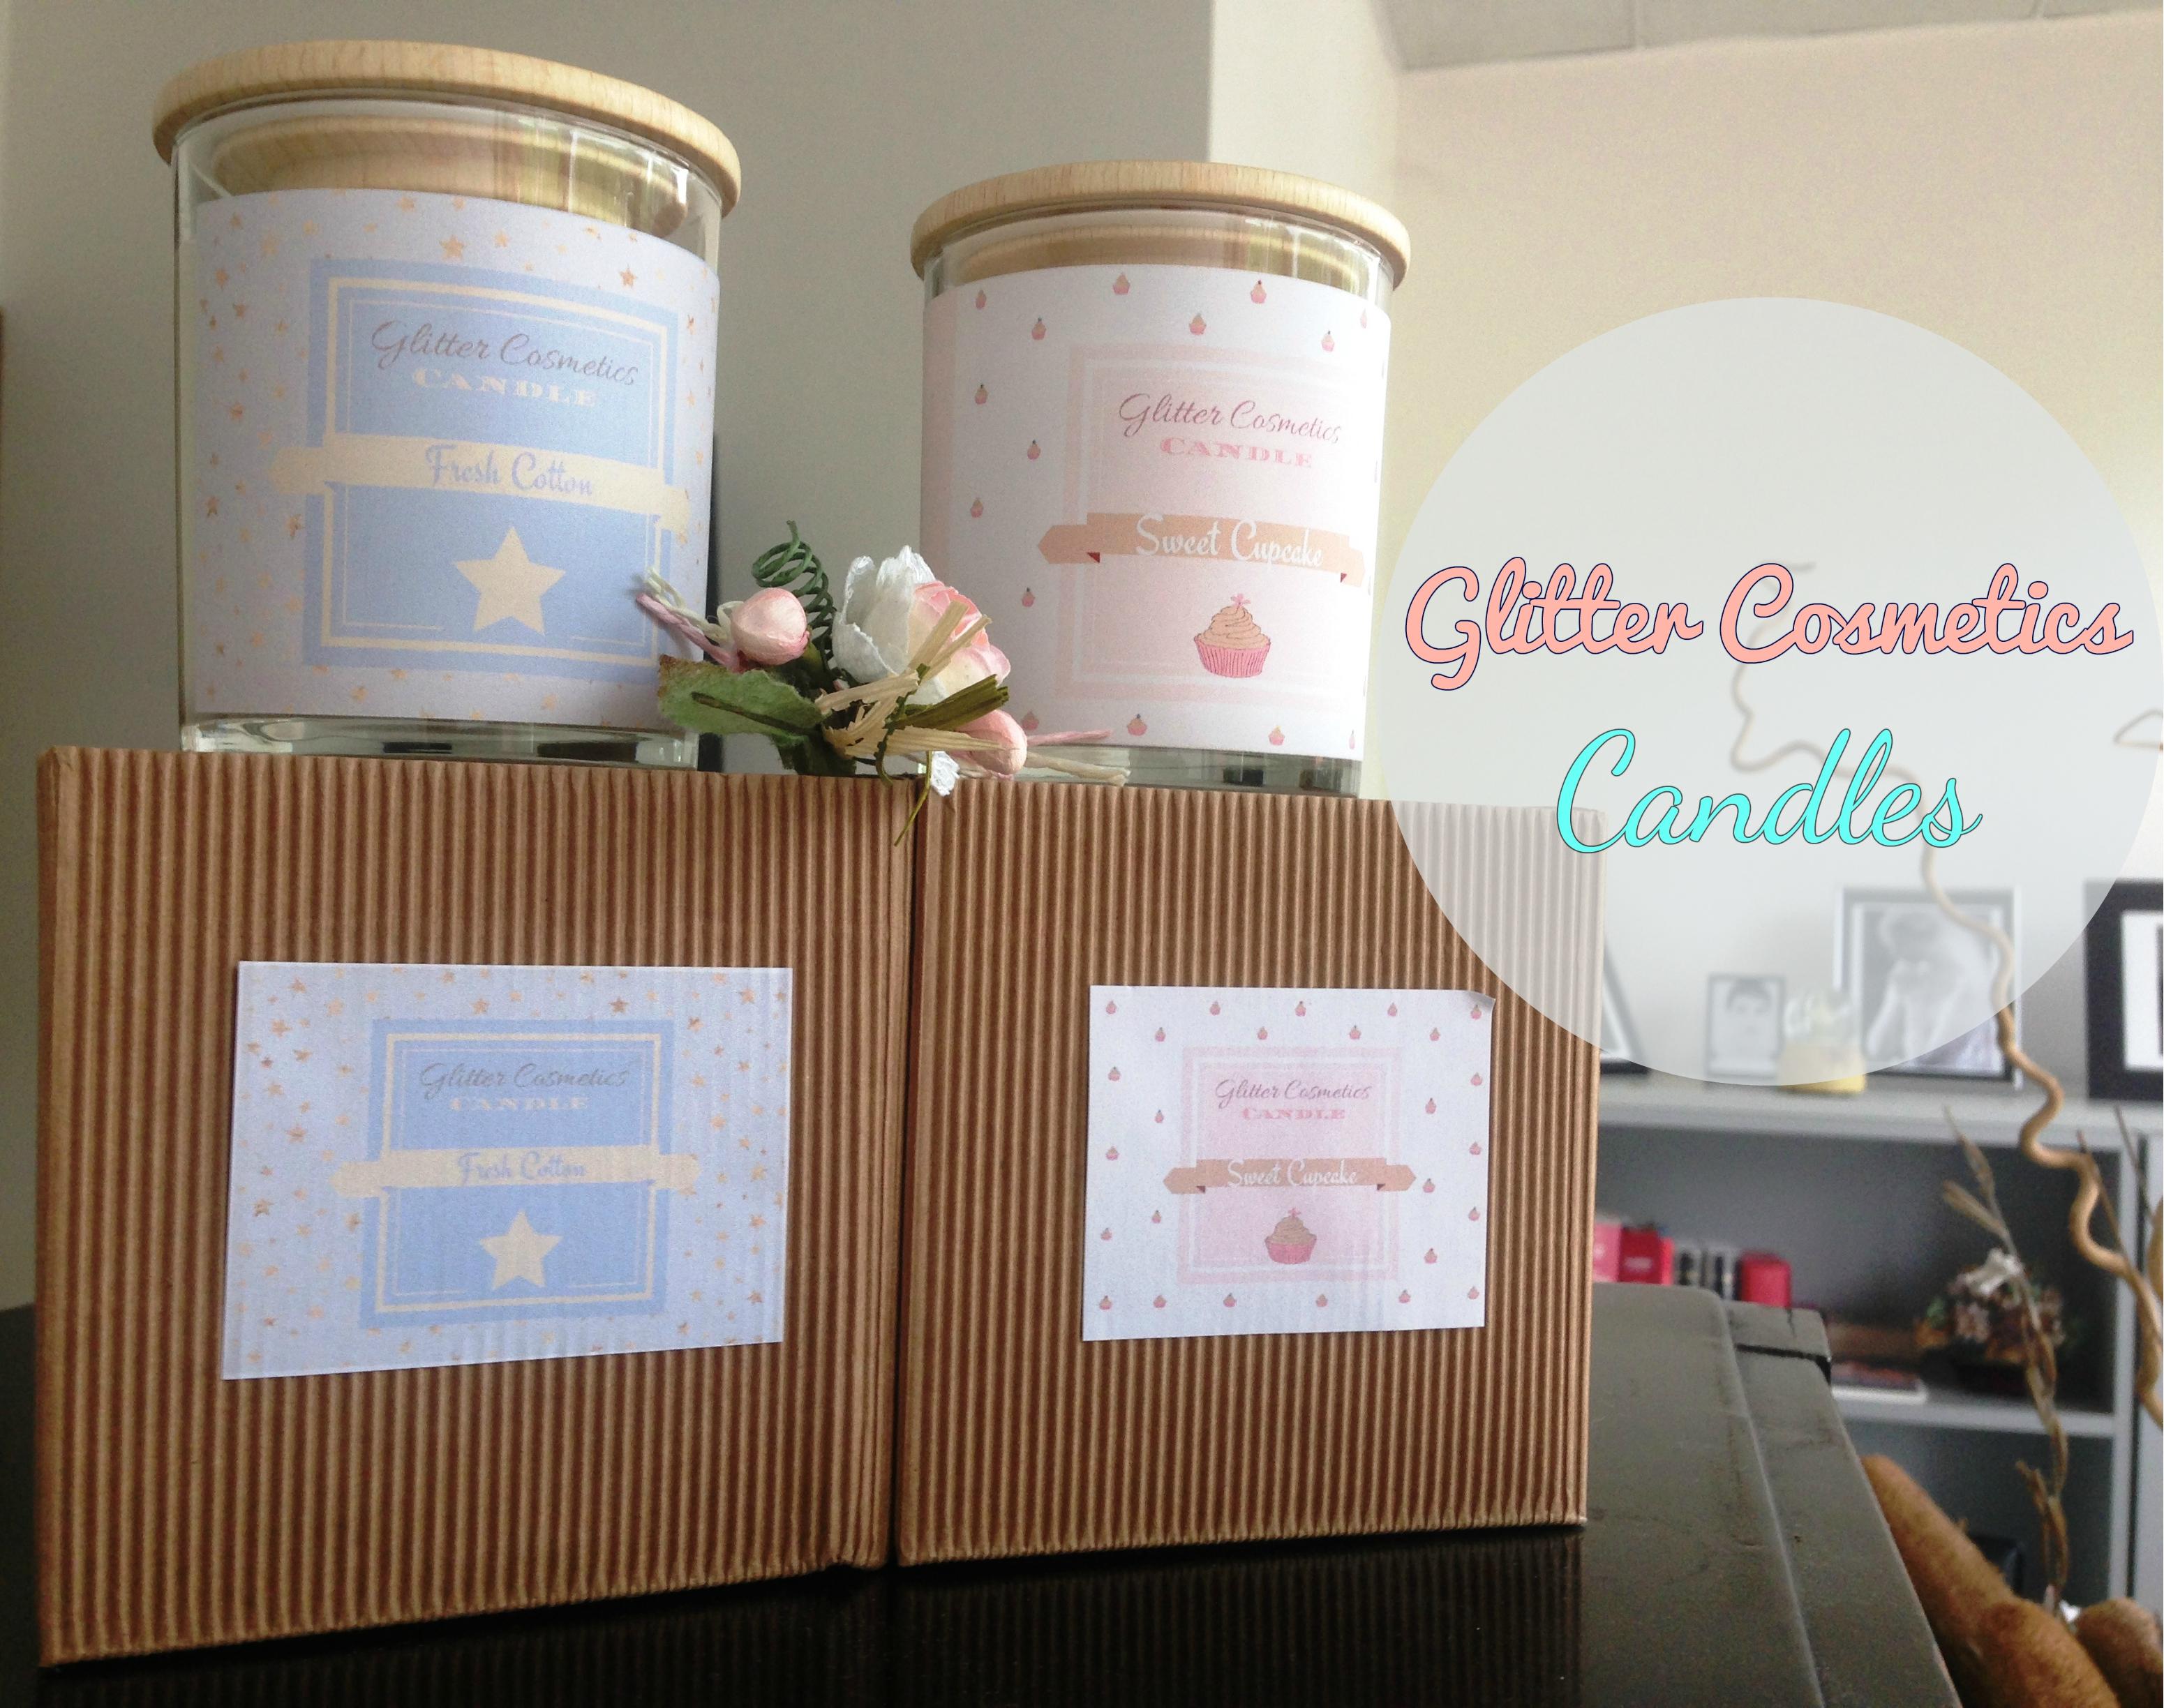 Glitter Cosmetics – New Candles